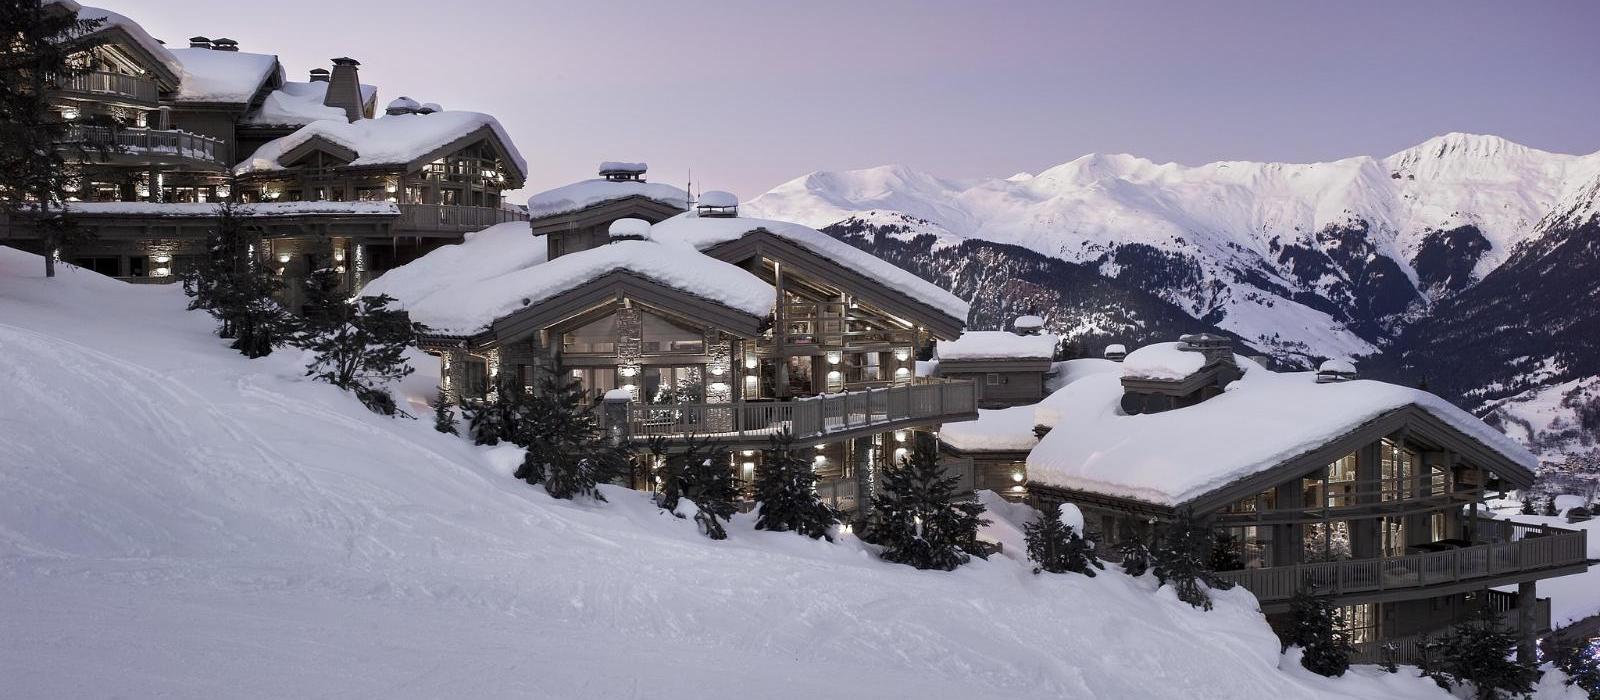 雪山乐途精品酒店(Hotel Le K2 Palace) 图片  www.lhw.cn